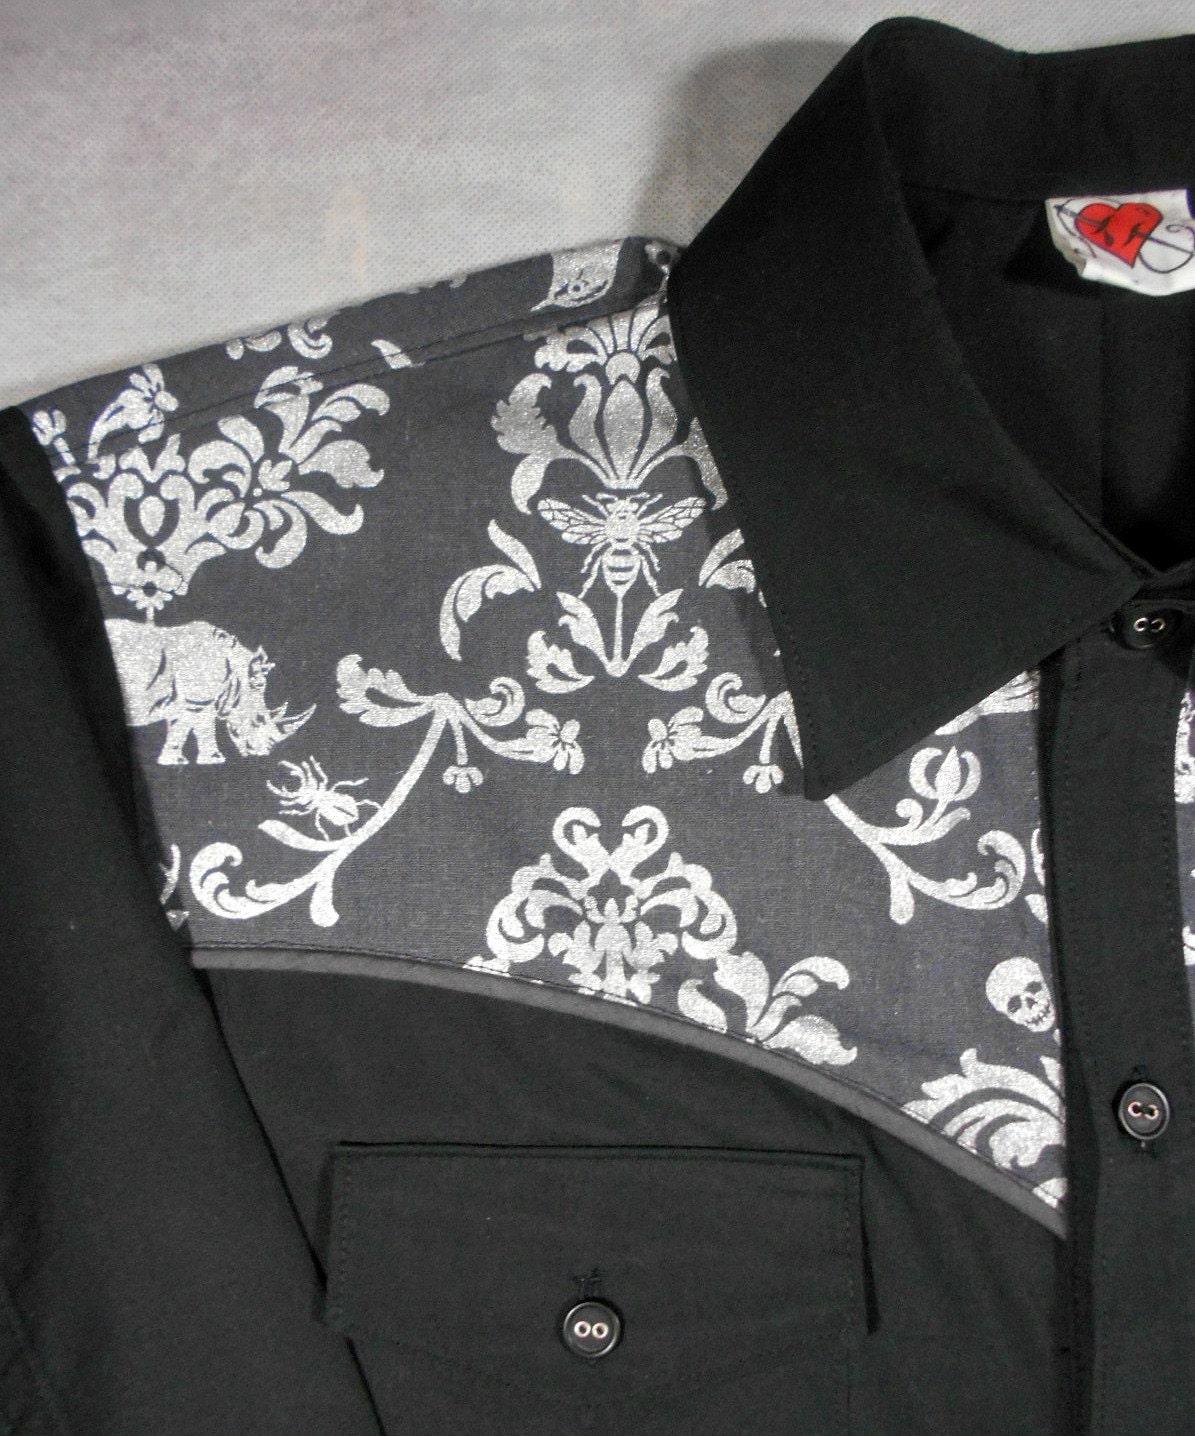 Metallic Western Shirt Cowboy Shirt Dress Shirt Rhino Etsy